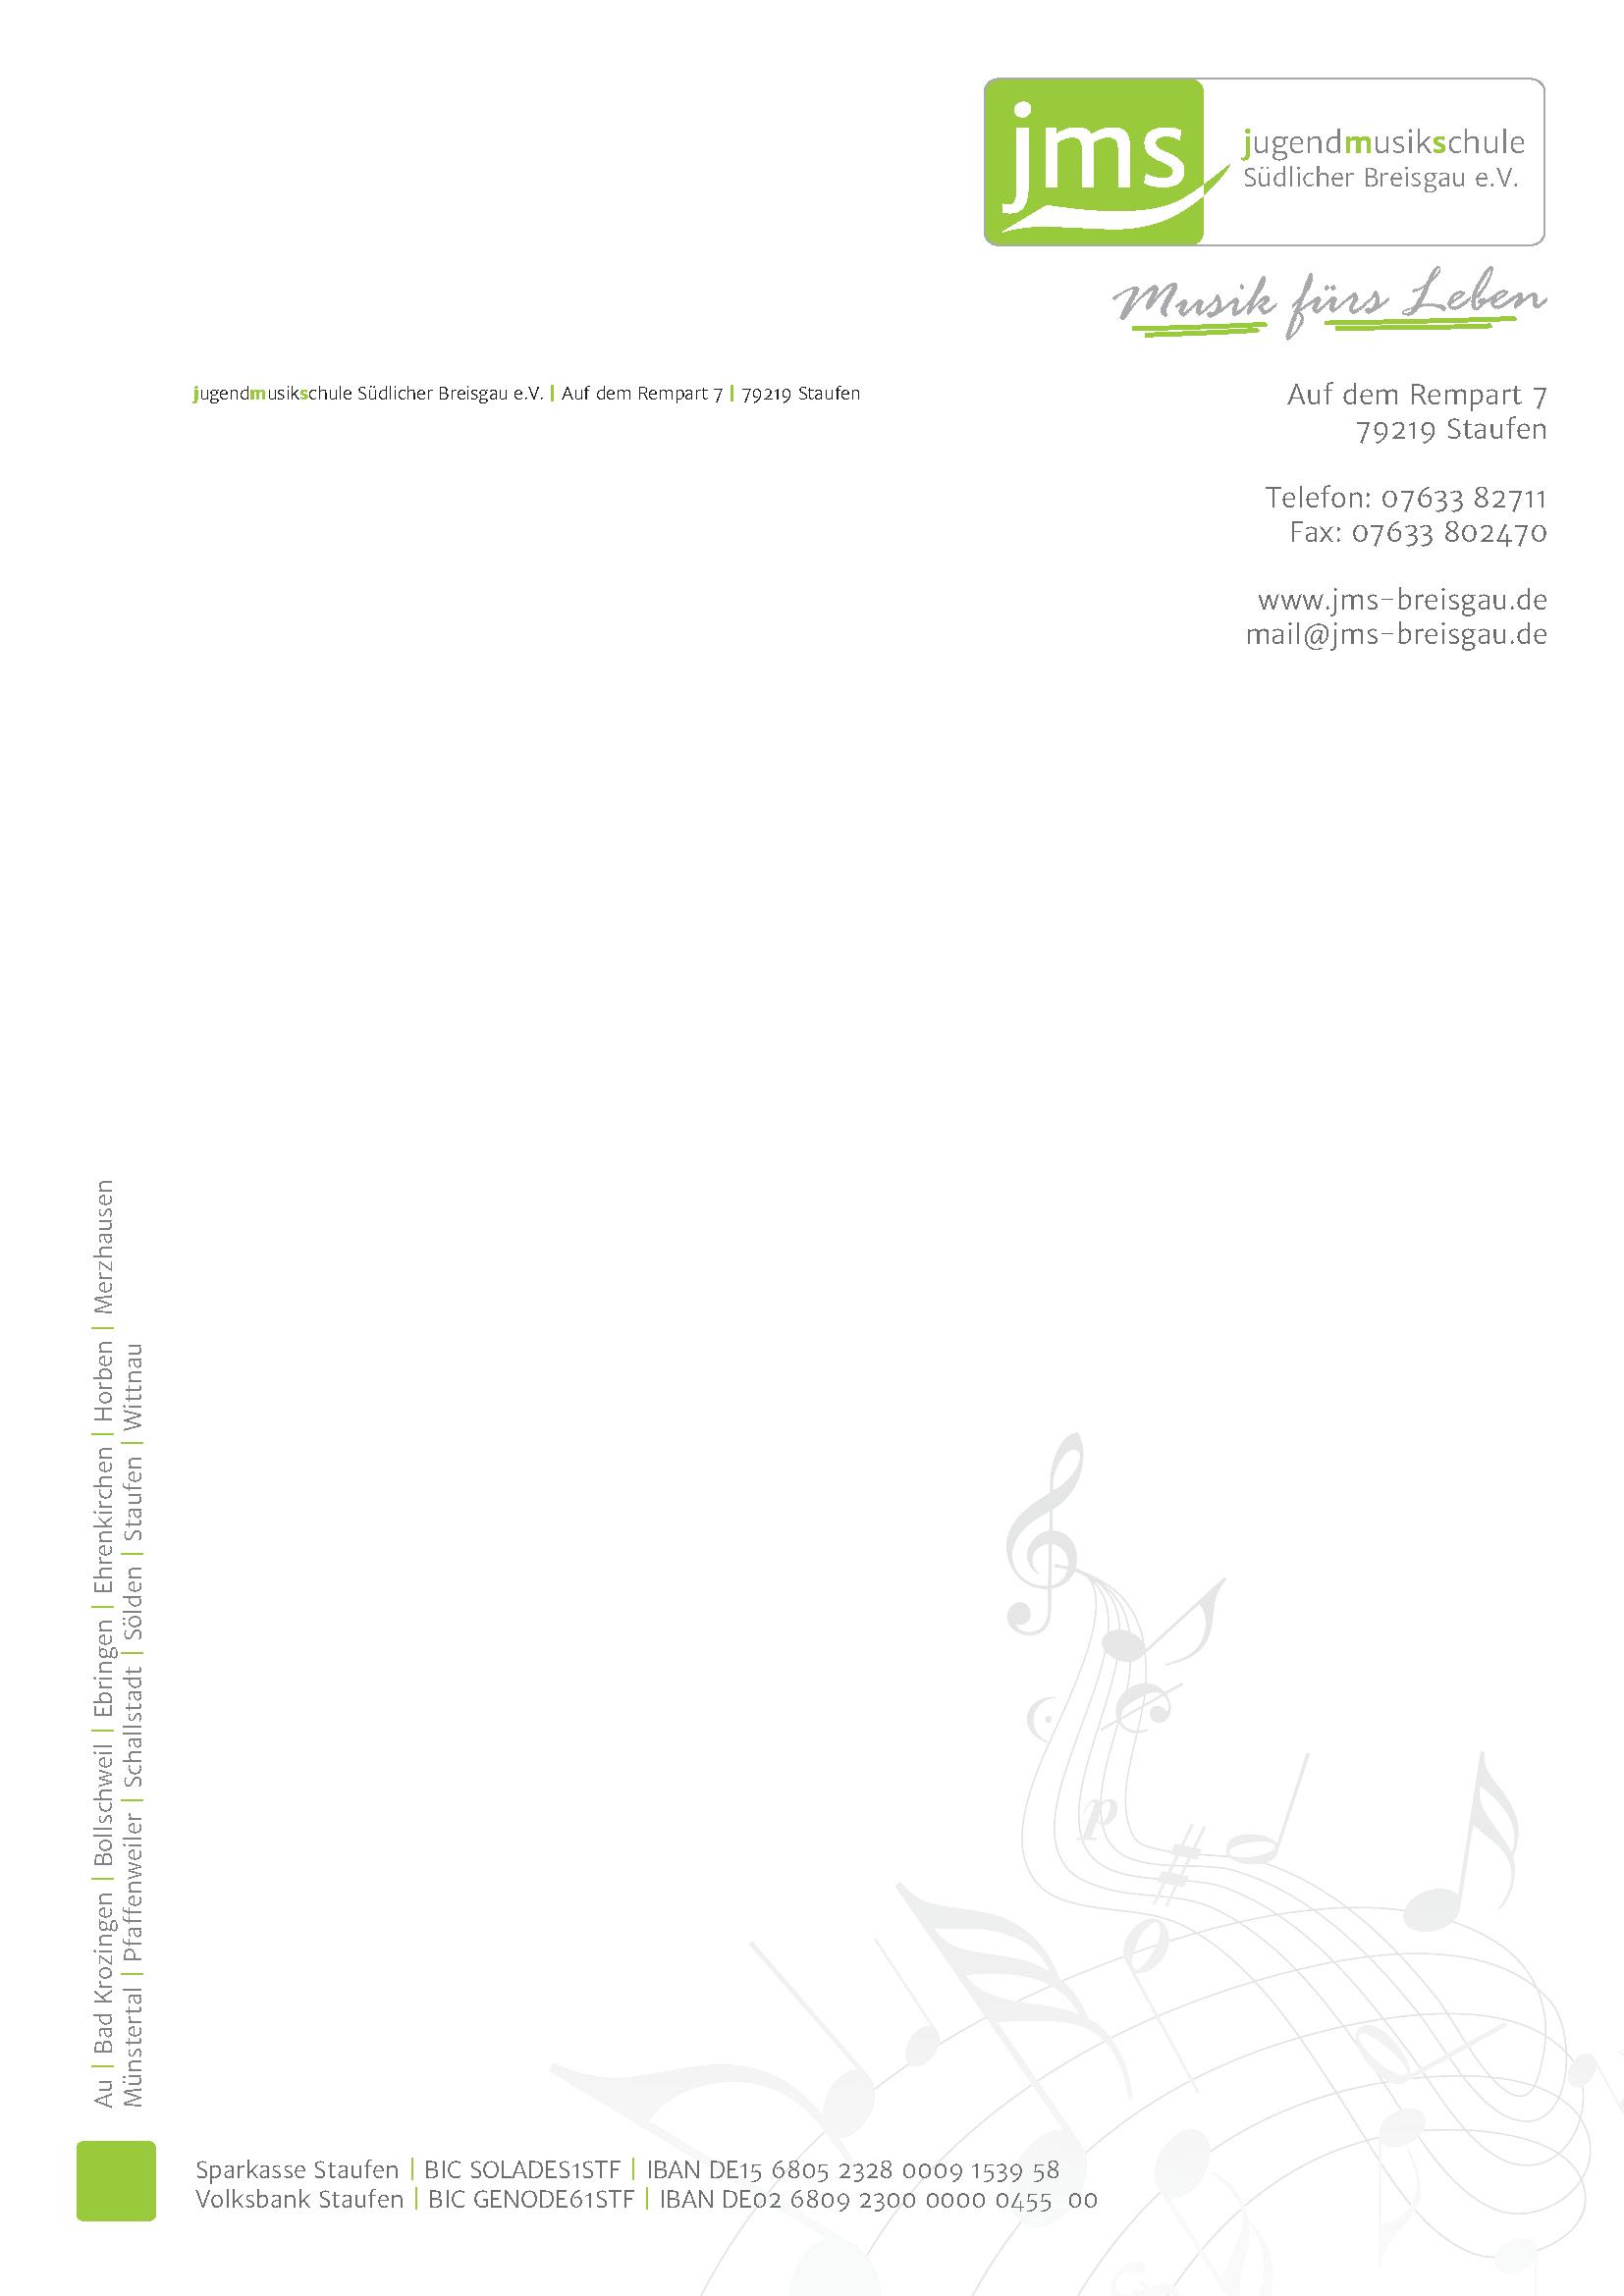 JMS Briefpapier